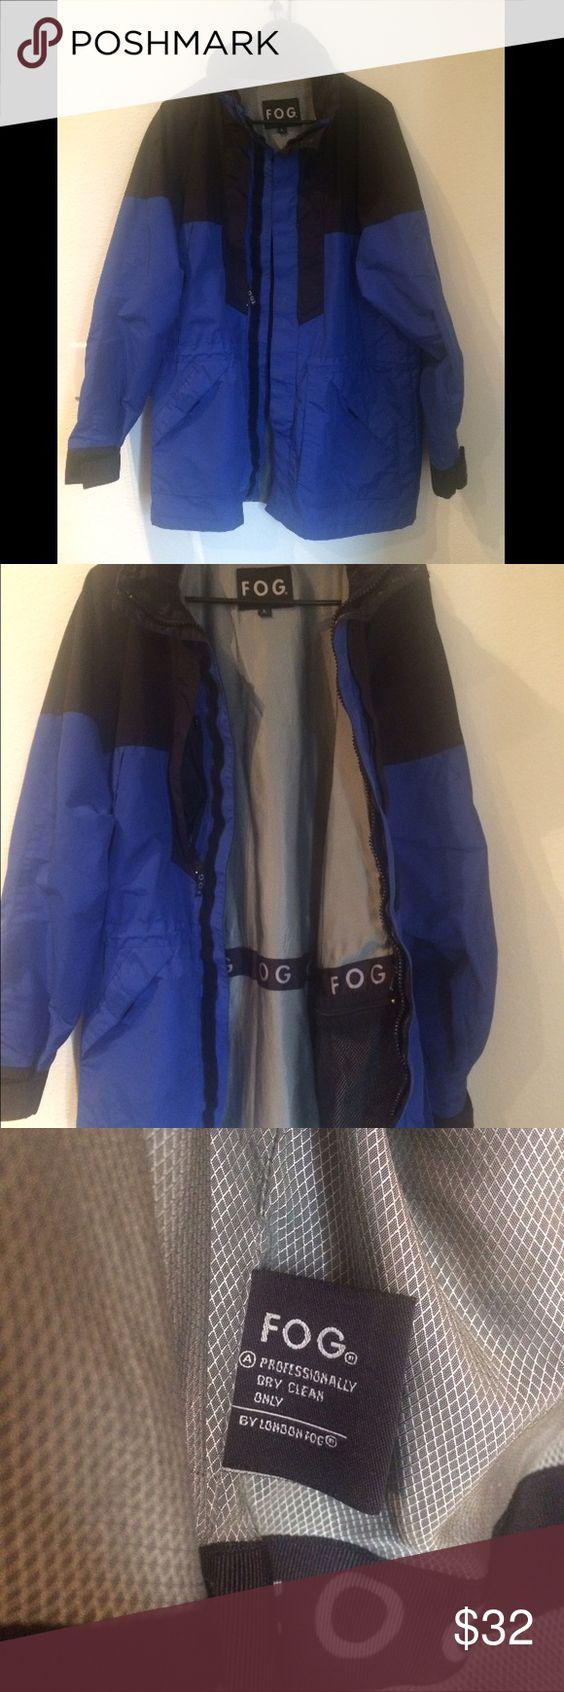 Fog men's jacket Tons of Pockets London Fog Jackets & Coats